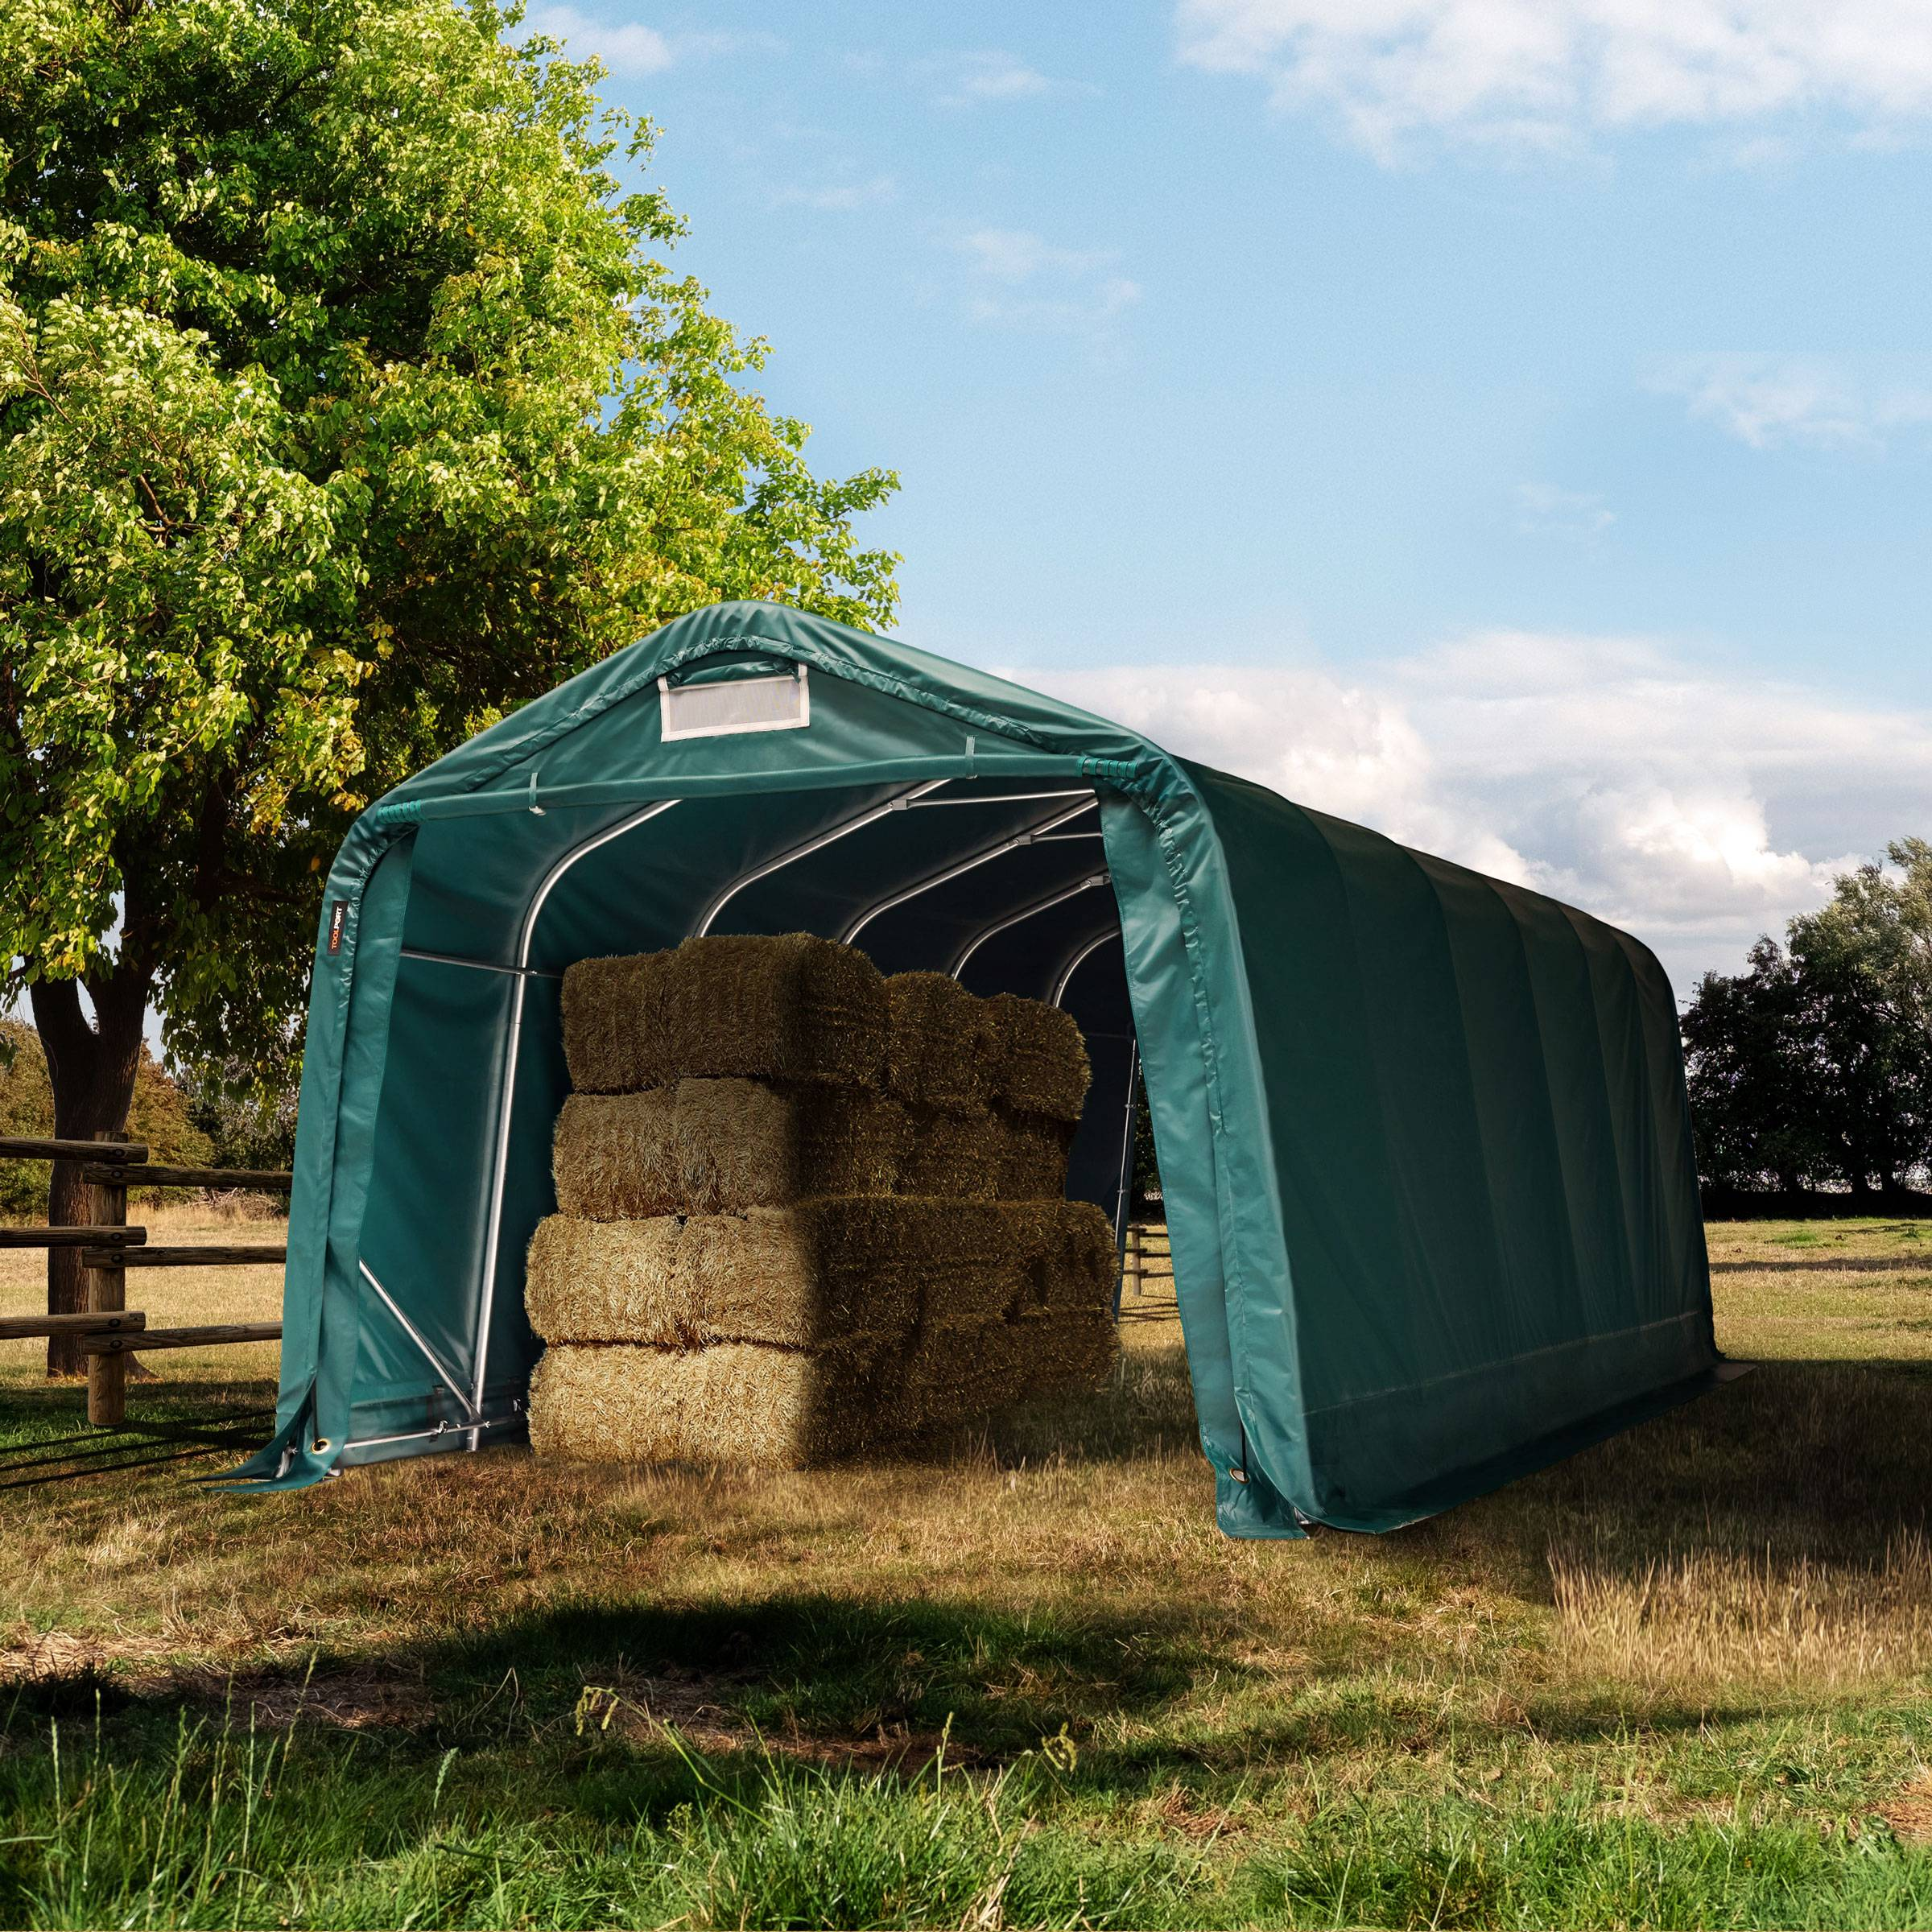 TOOLPORT Pasture tent 3,3x7,2m PVC 550 g/m² dark green waterproof